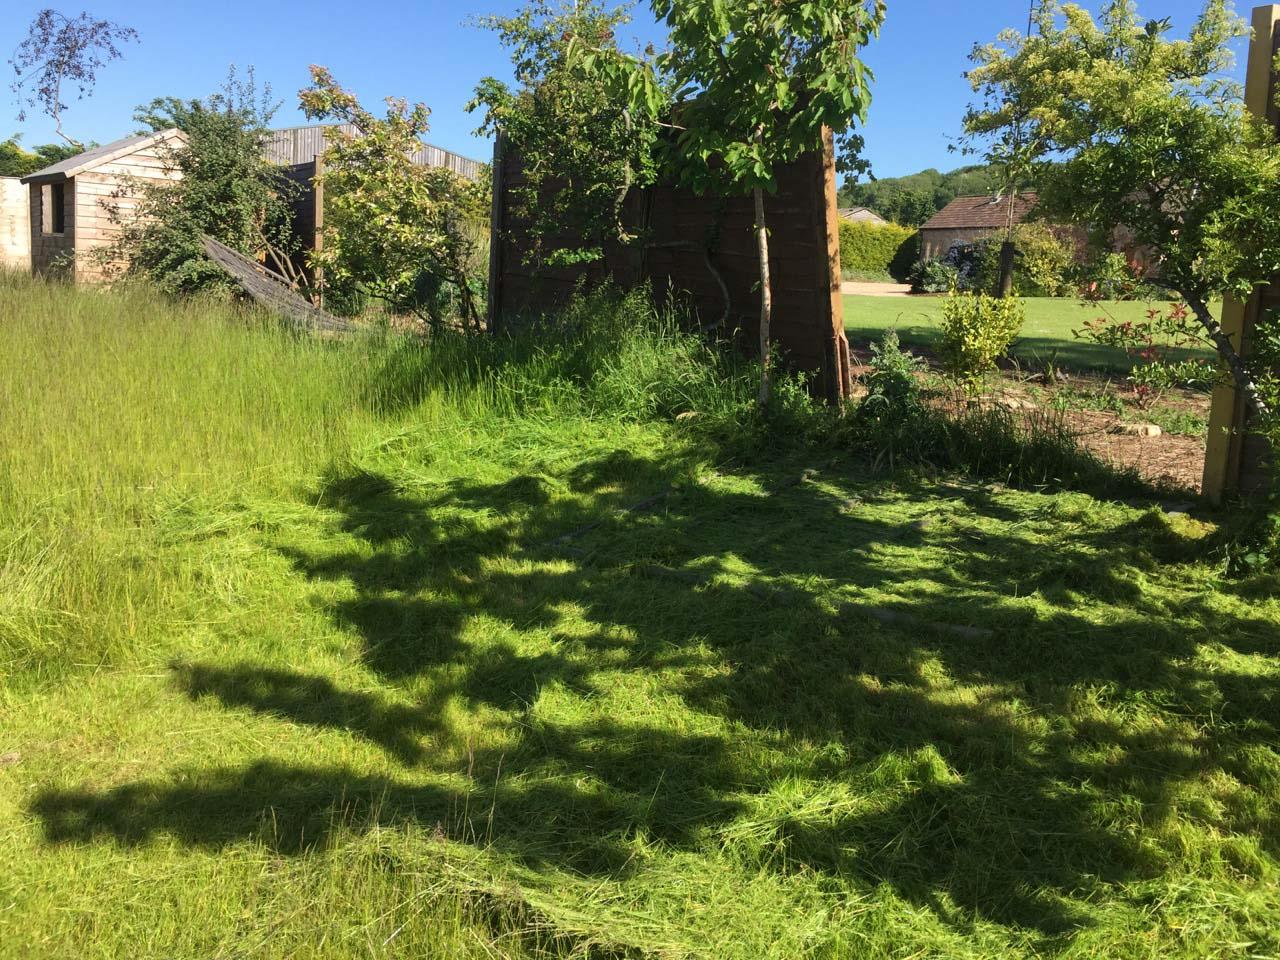 Overgrown grass cutting during